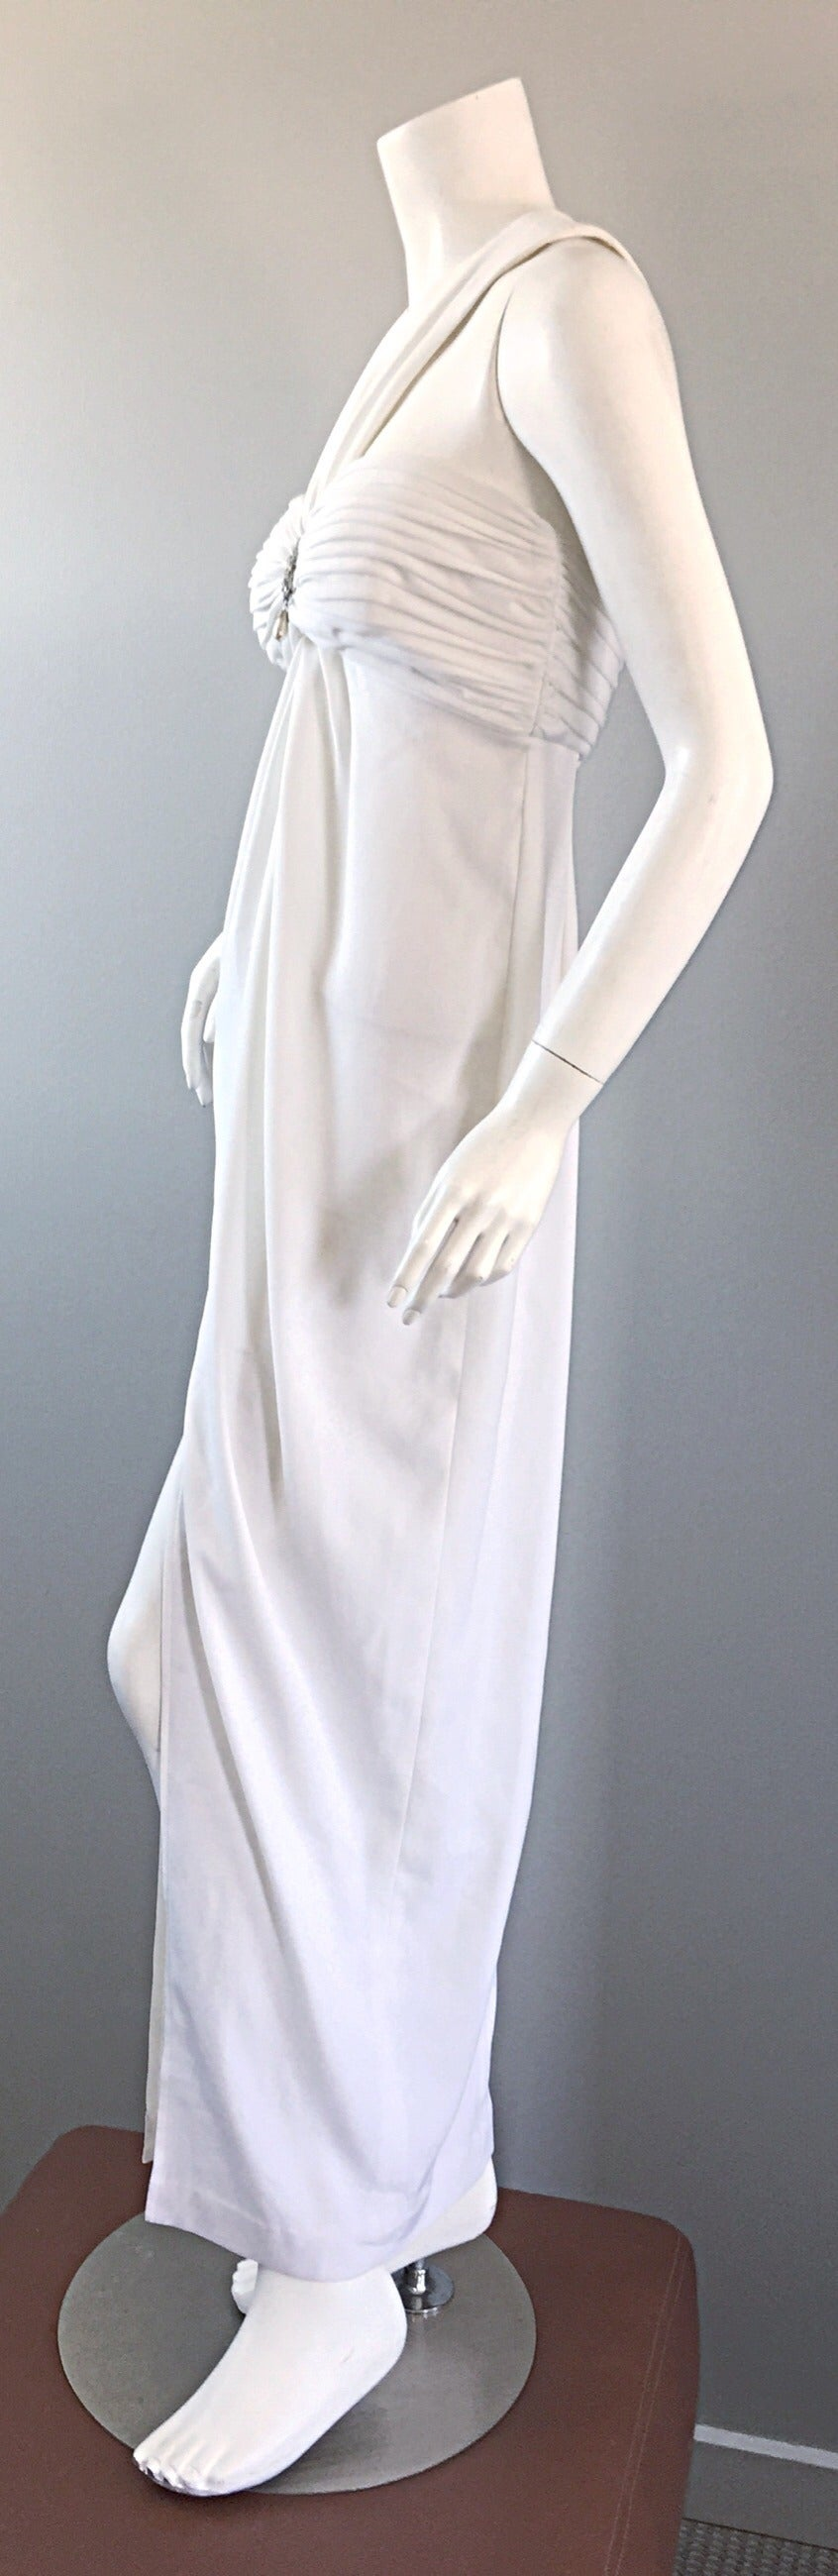 1990s Vintage Tadashi Shoji White 90s Grecian Dress w/ Rhinestones + Pearl For Sale 2